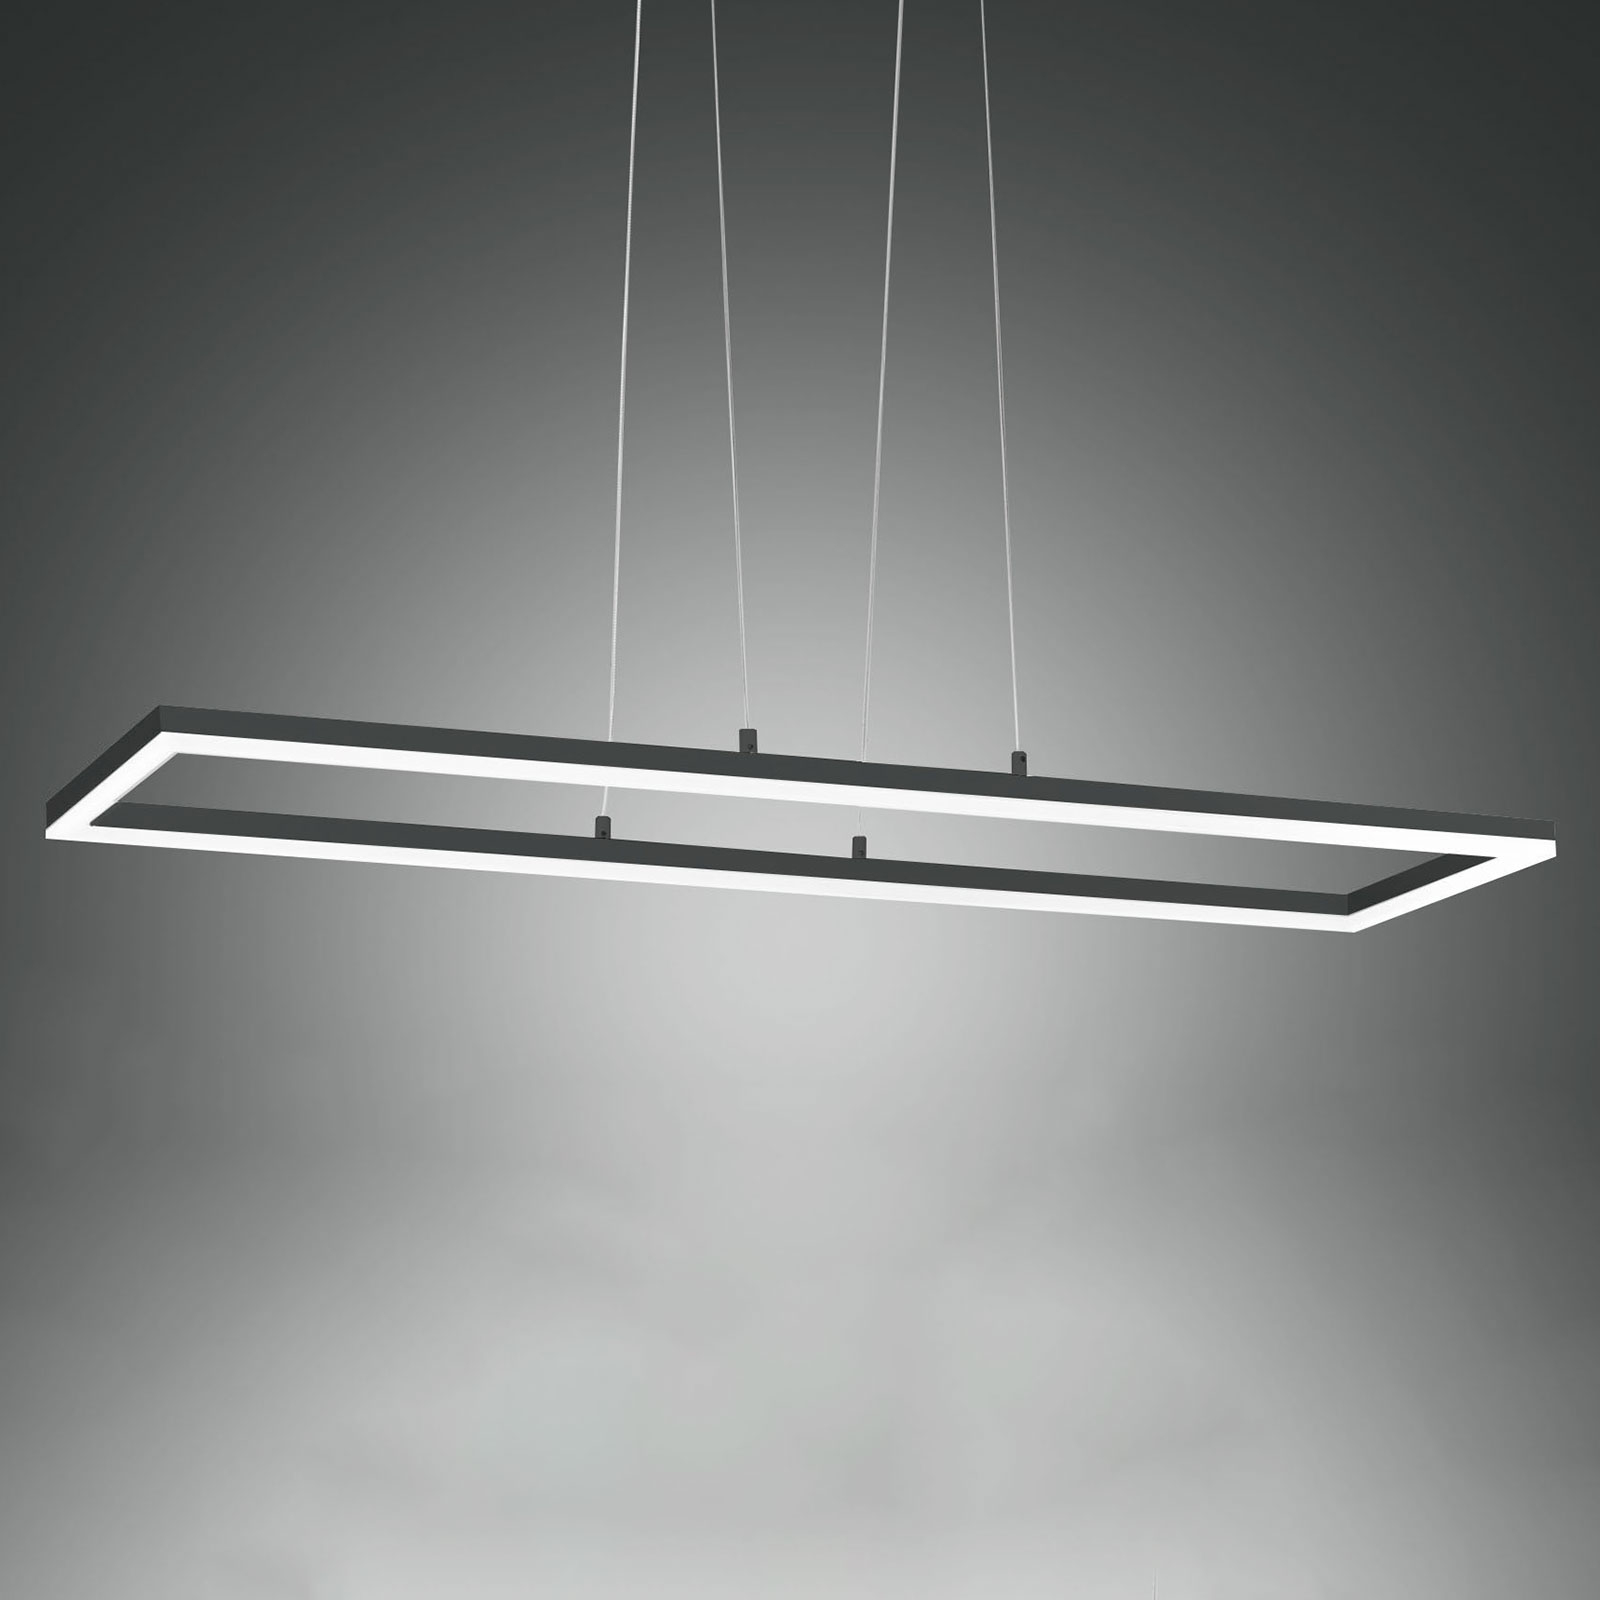 Suspension LED Bard, 92x32cm, anthracite